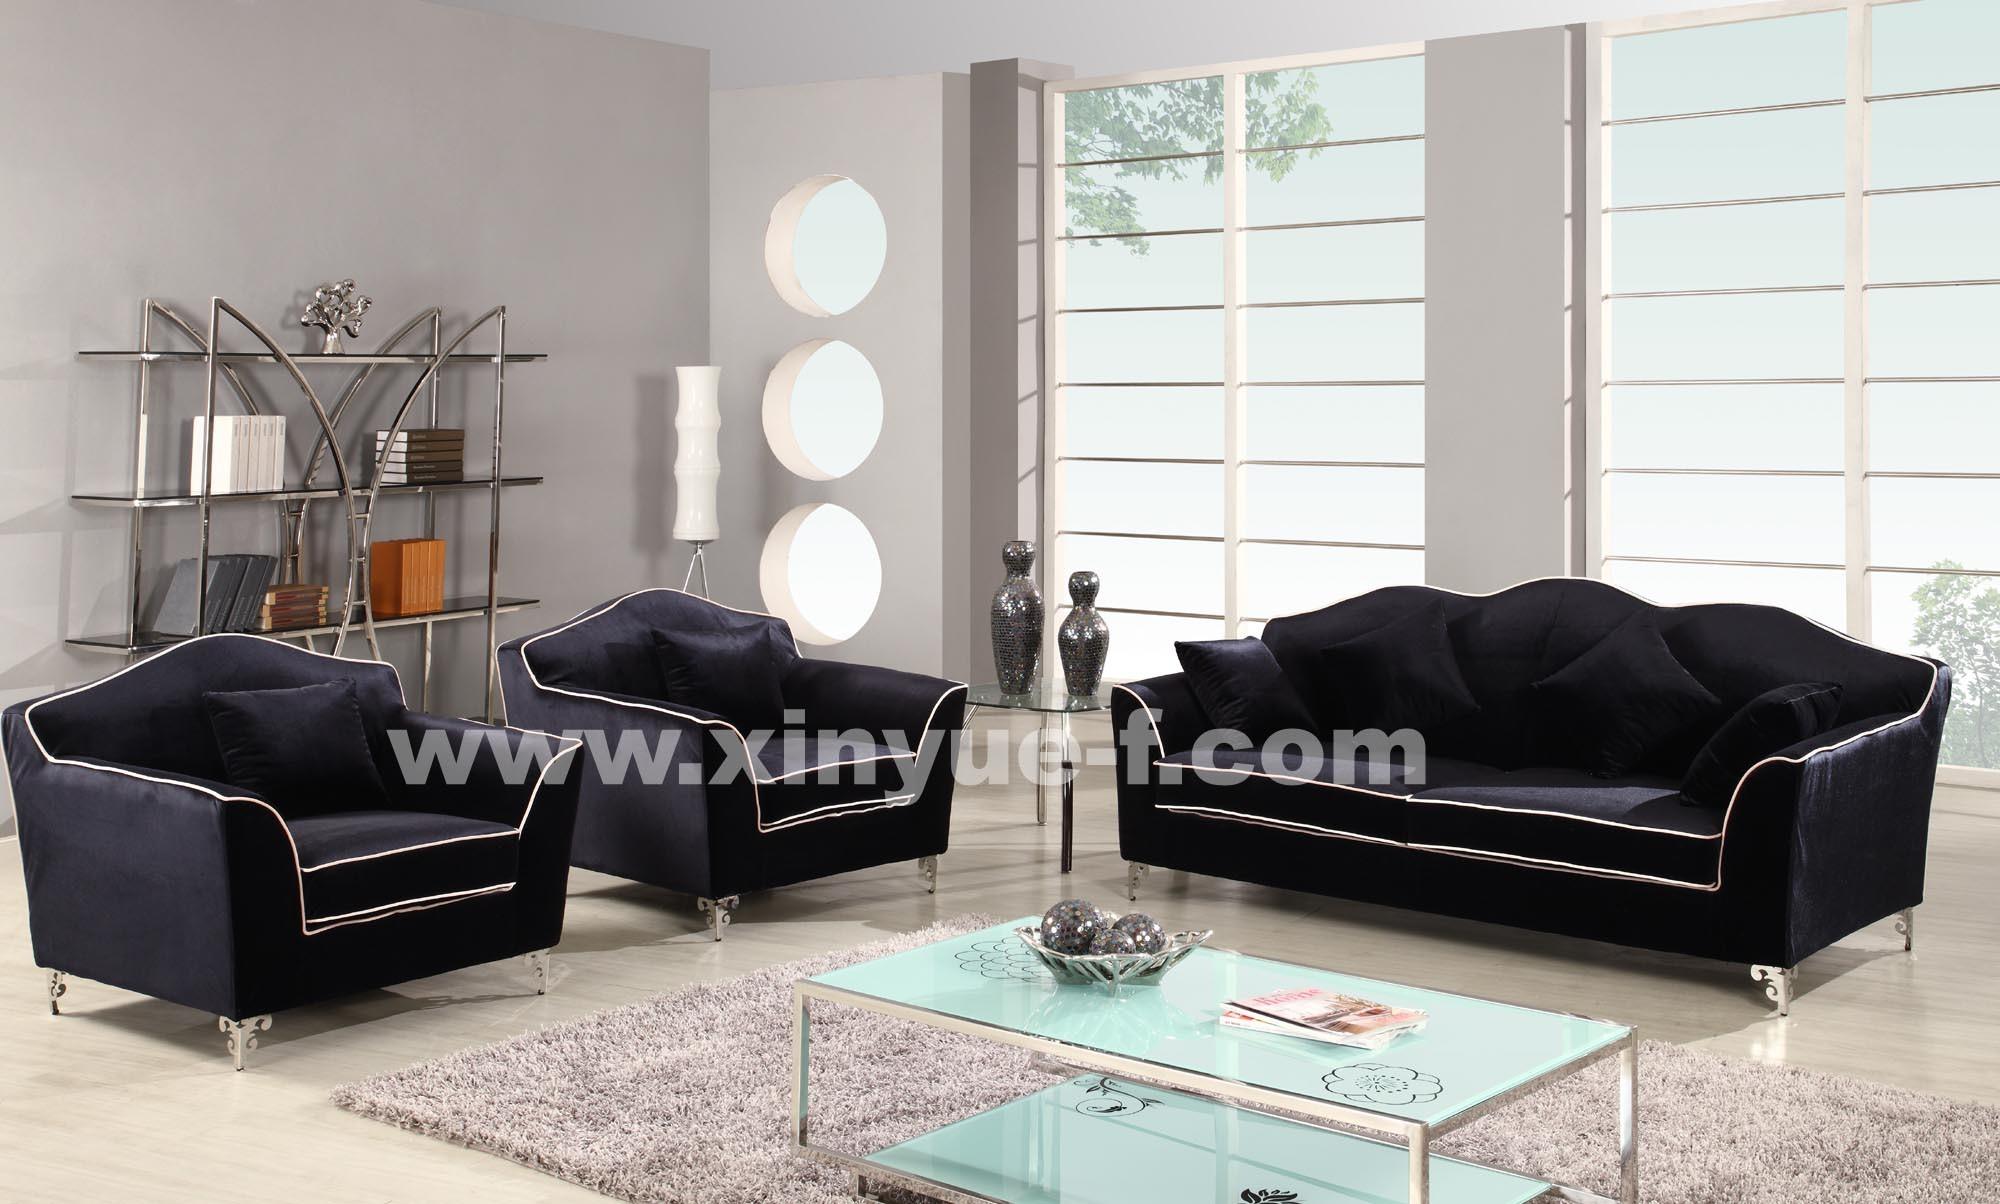 China modern sofa xy 95 china modern sofa fabric sofa